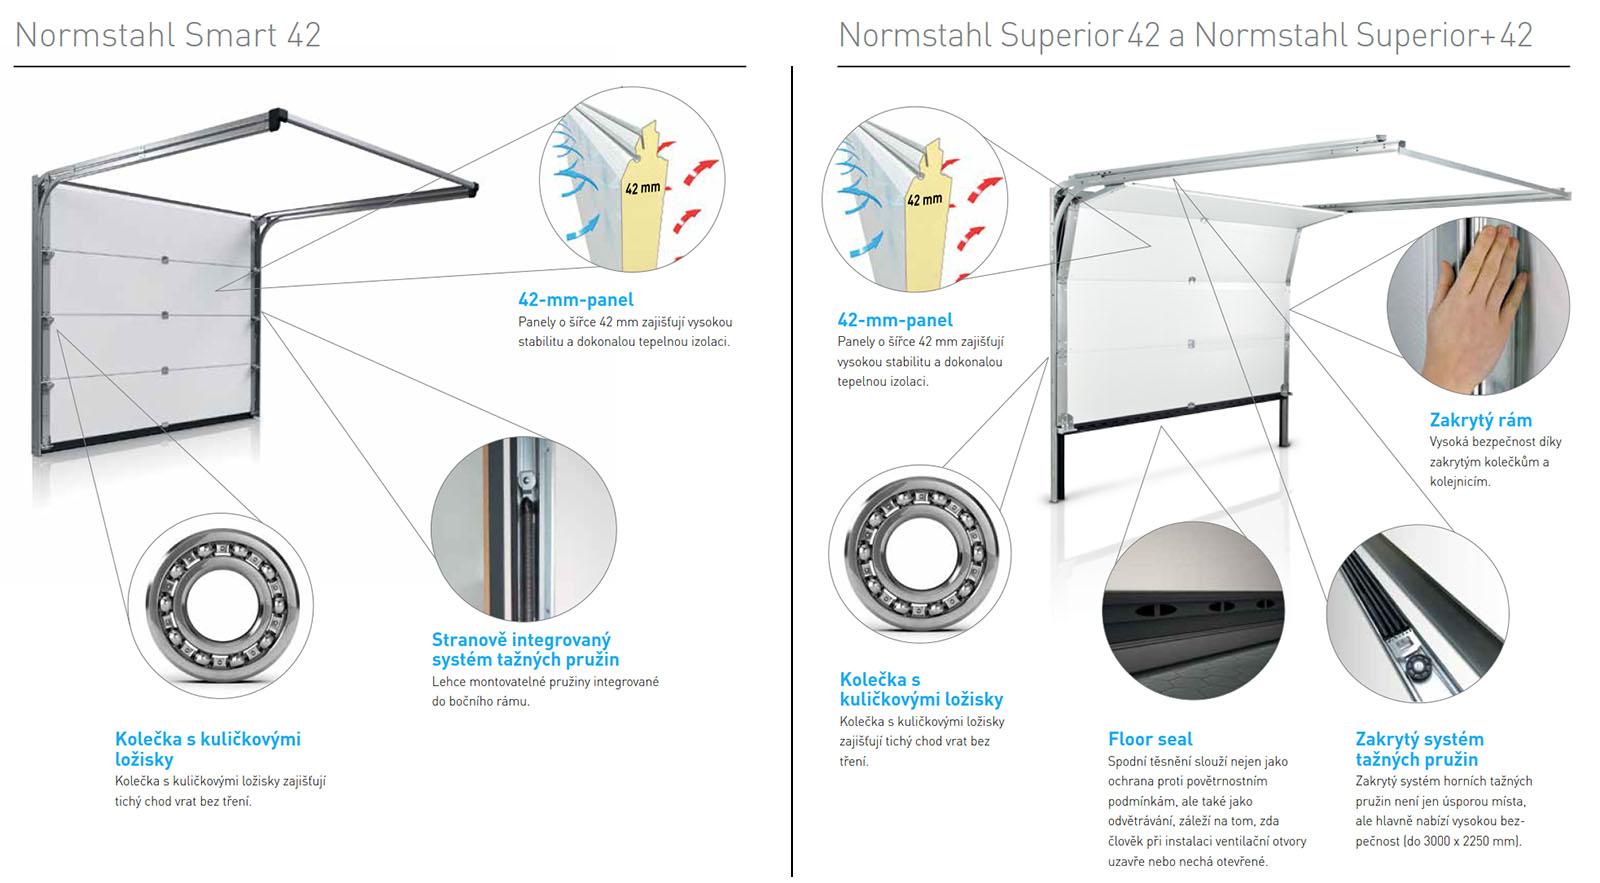 Rozdil mezi Smart24 a Superior42 a +42